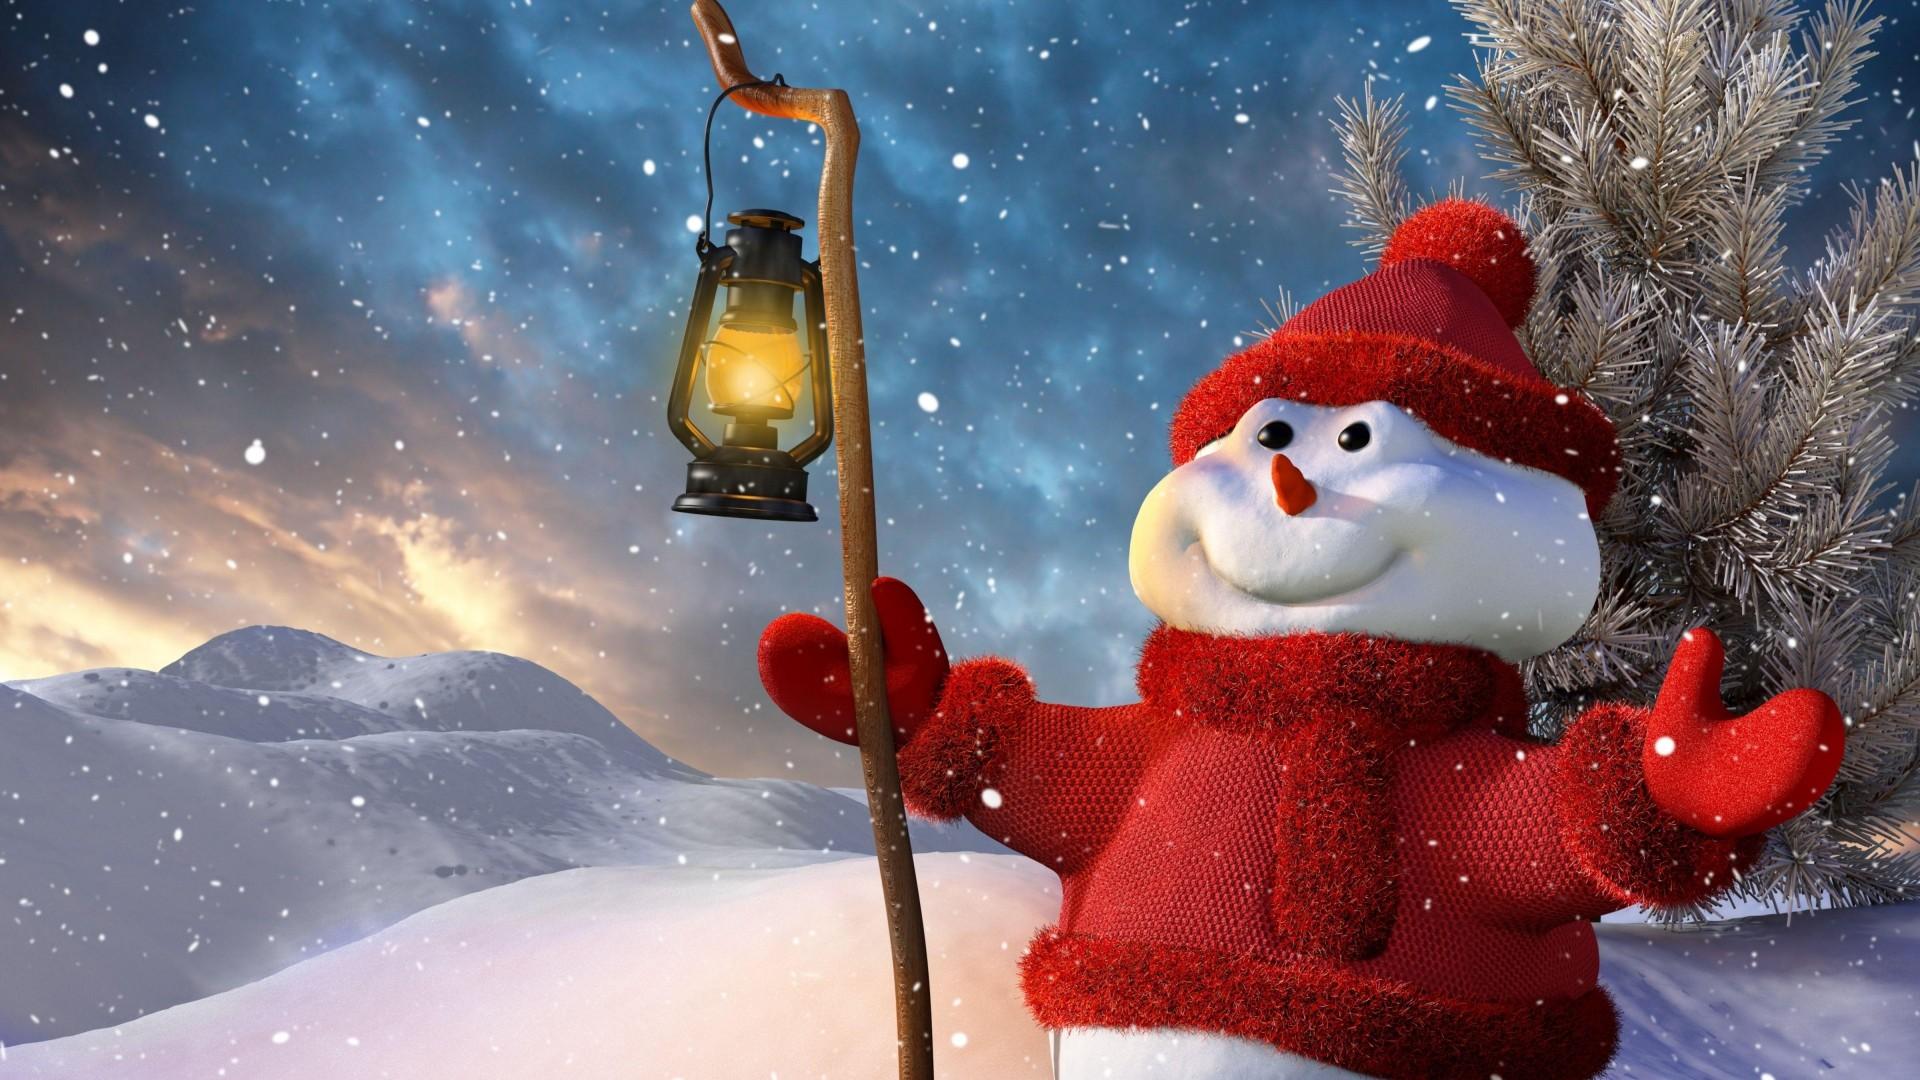 Christmas Wallpapers Snowman Cartoon